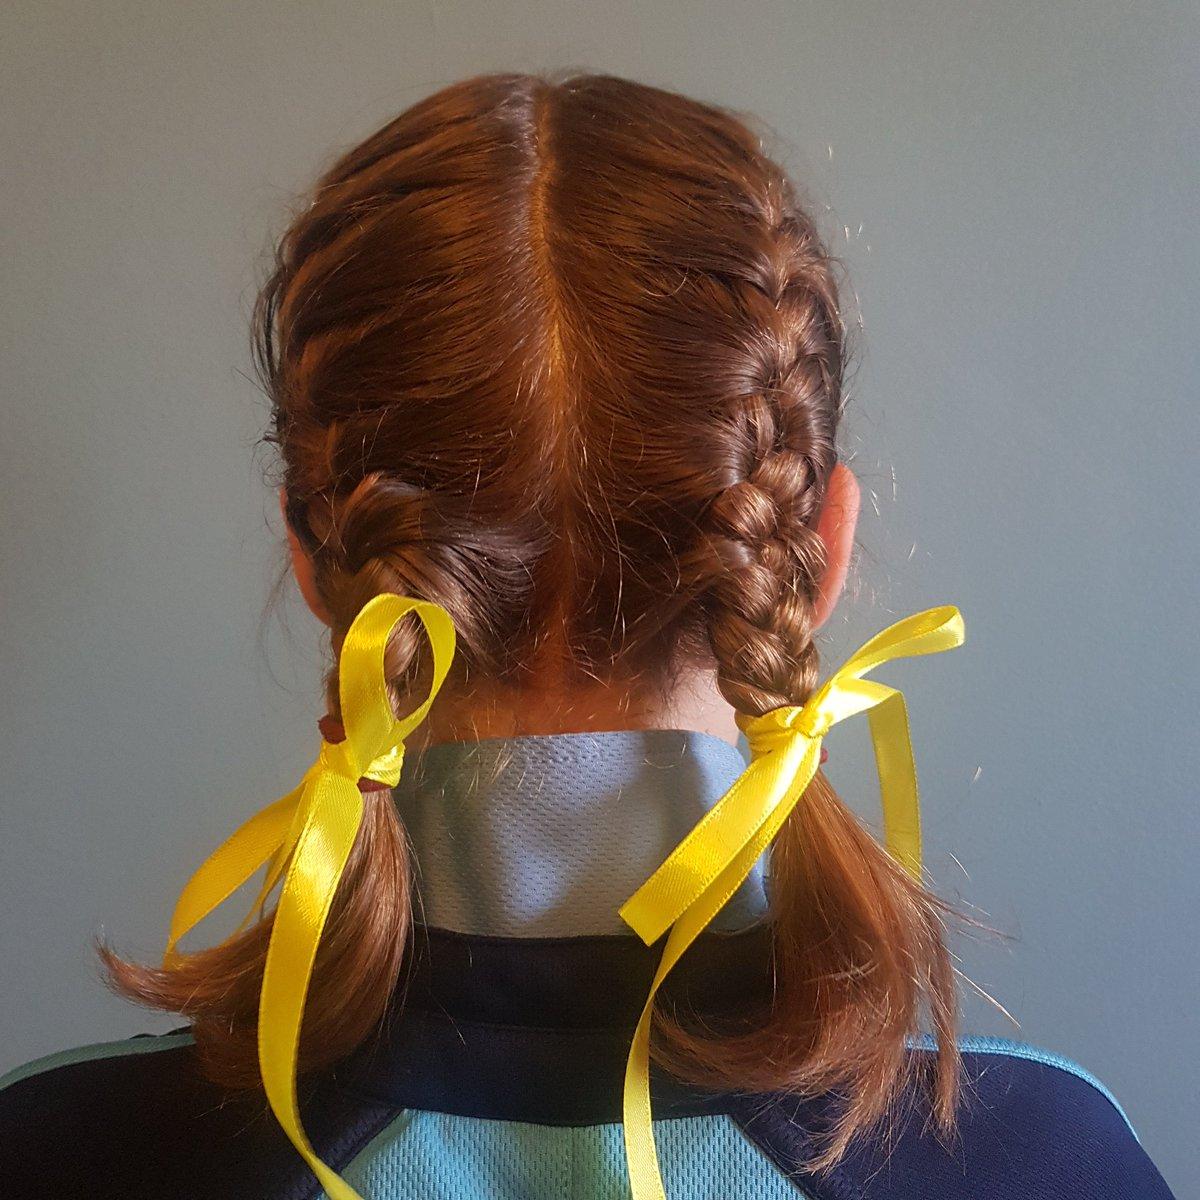 @YoungMindsUK My daughter wearing yellow for #HelloYellow 💛💛💛